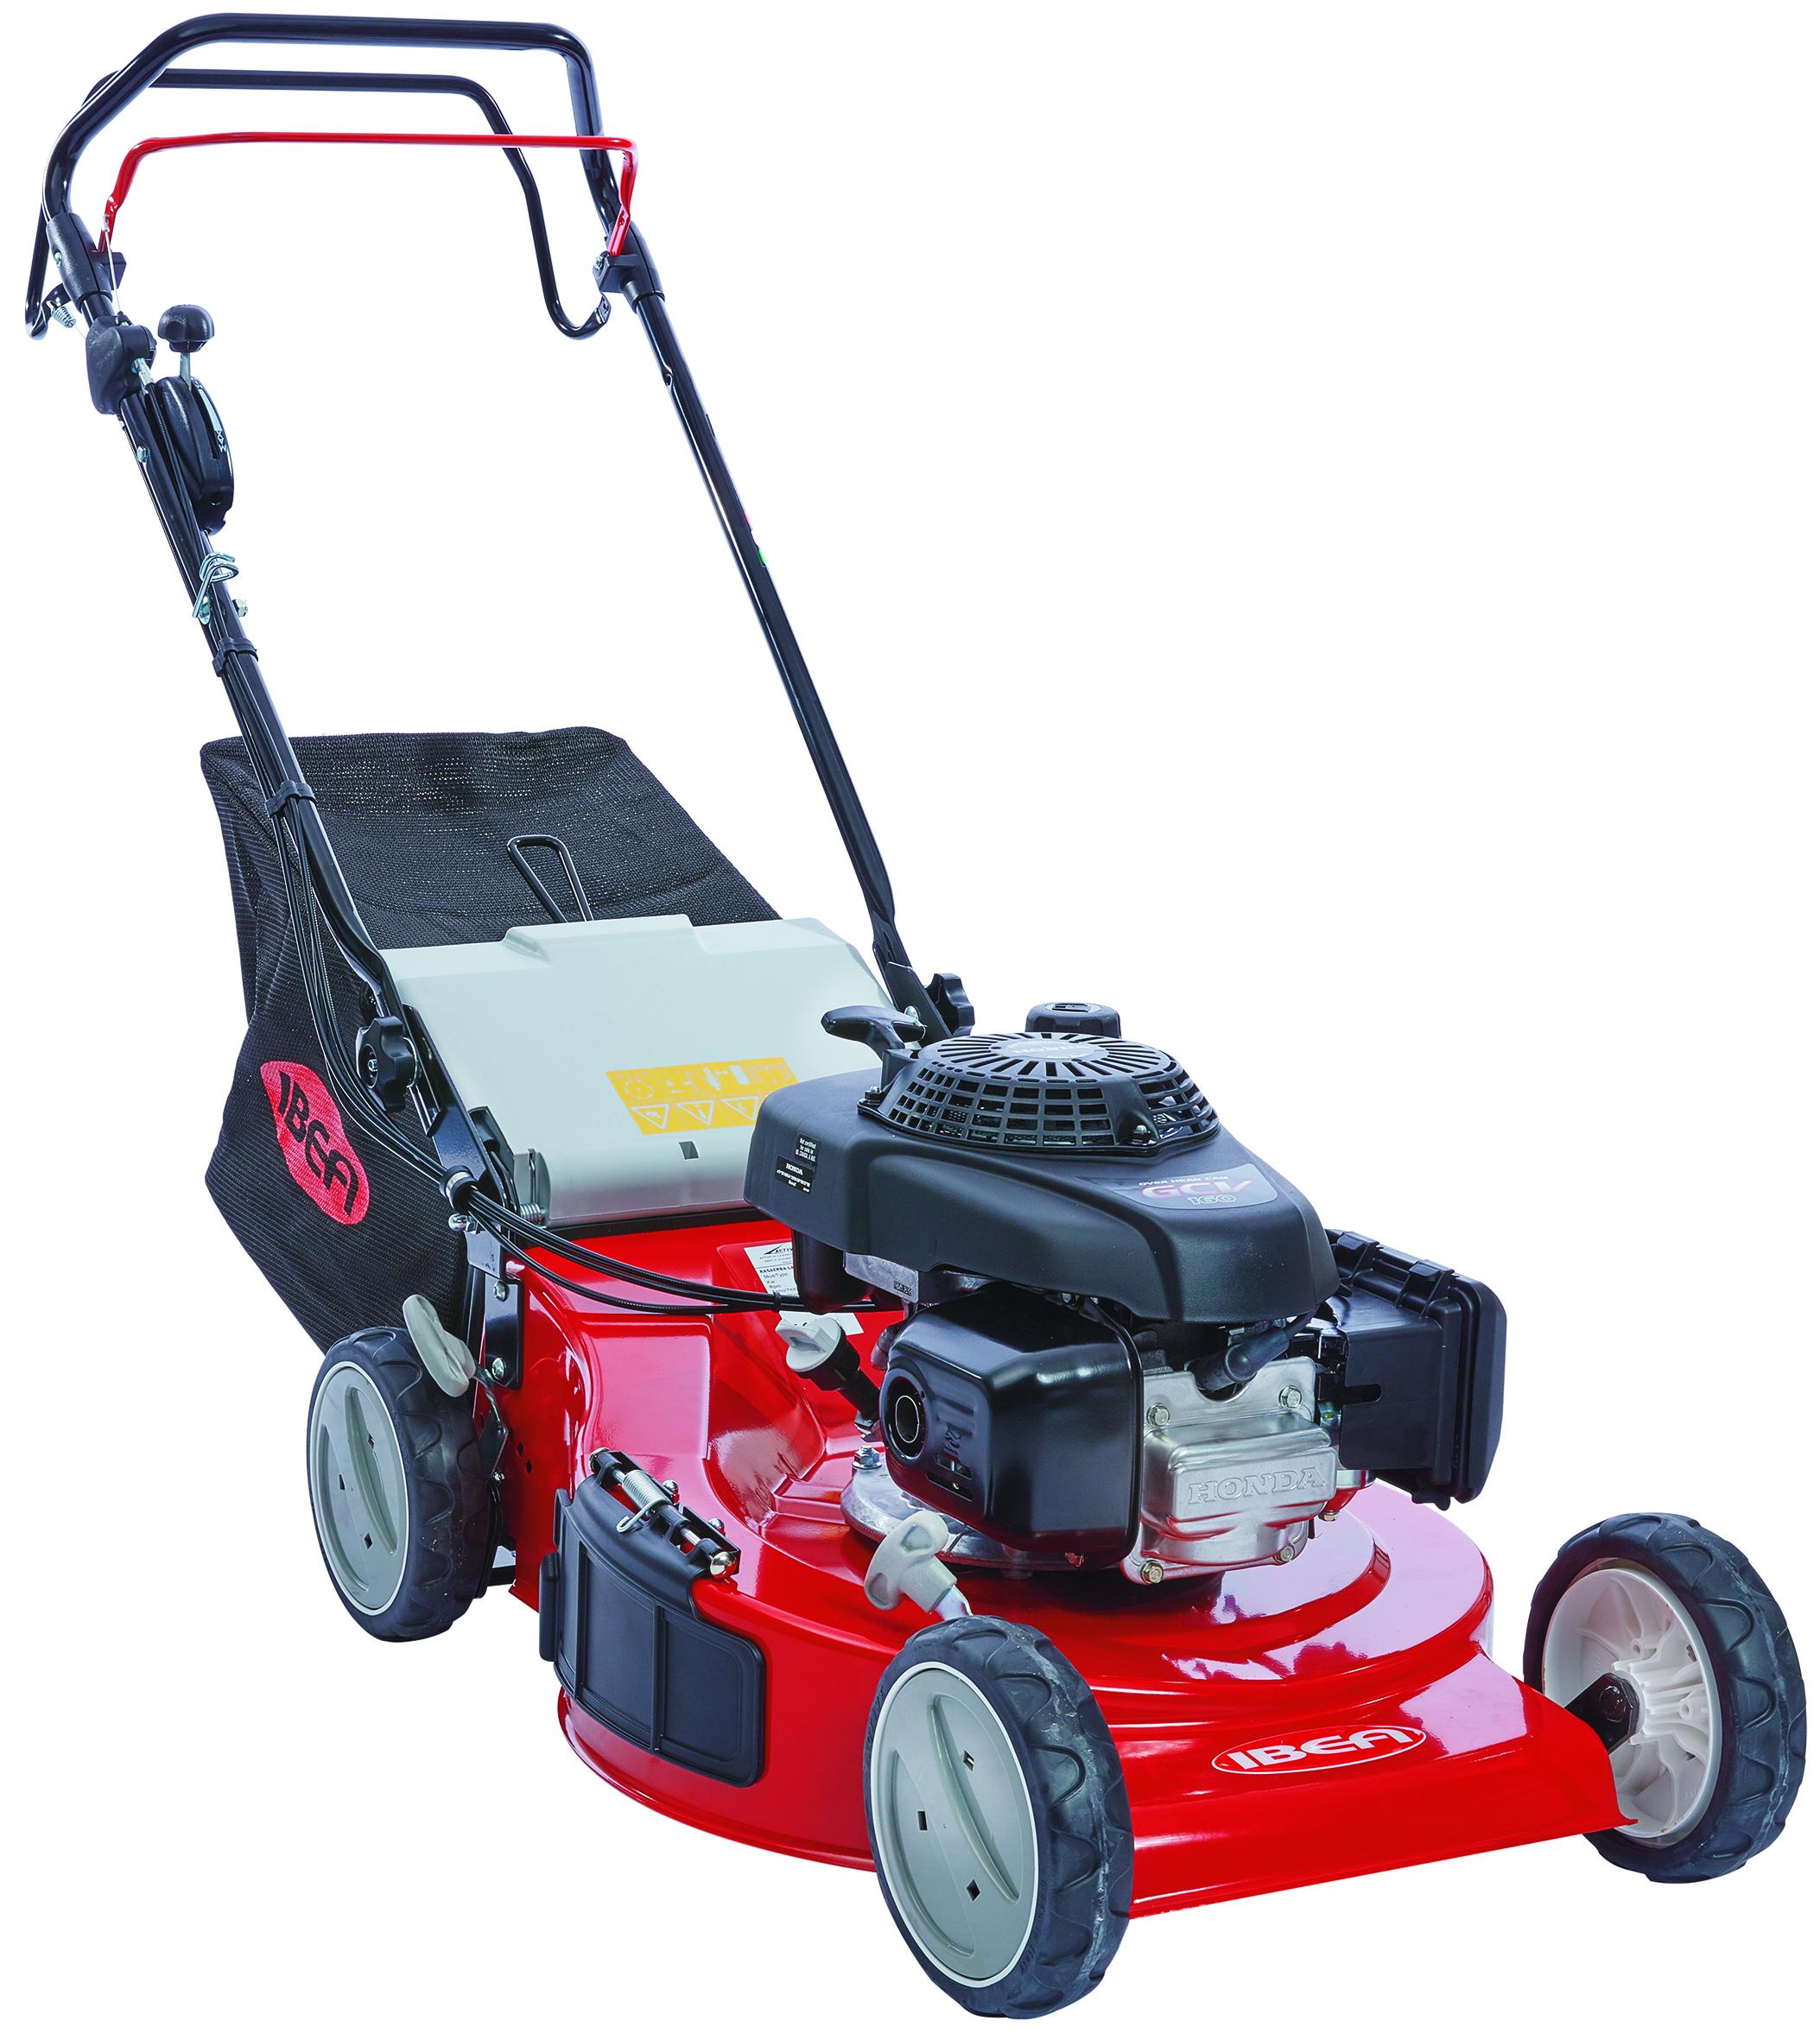 IBEA 53SH lawnmower